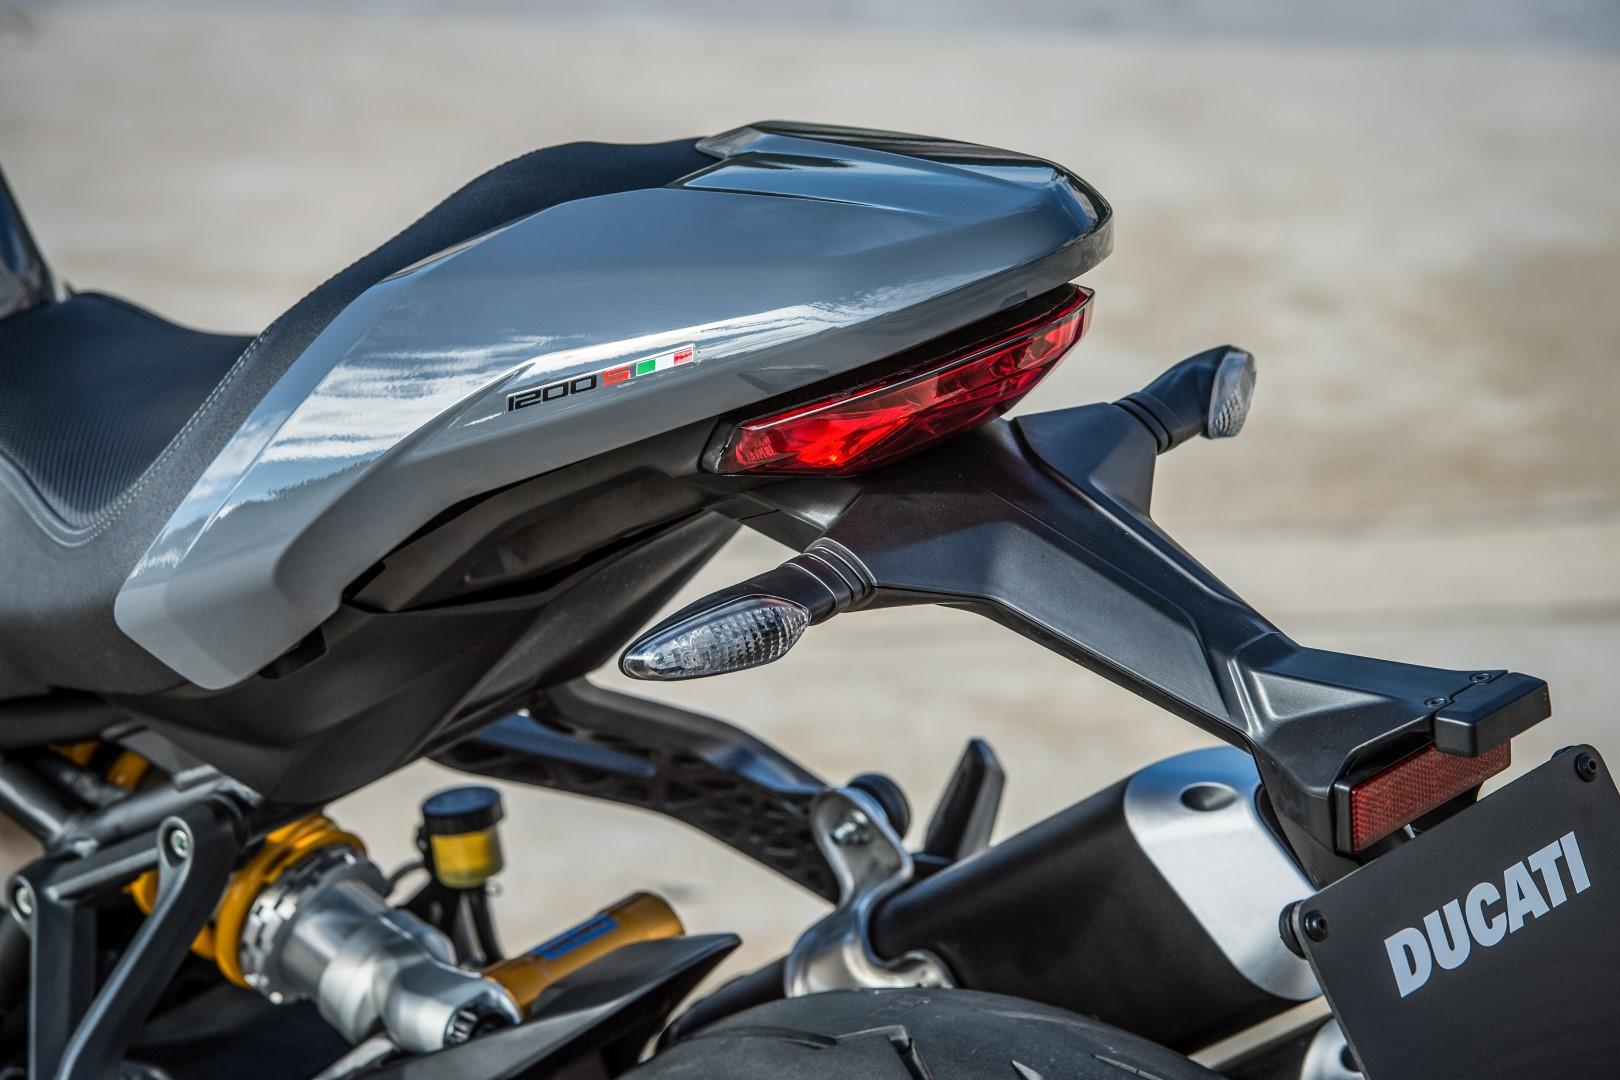 Presentación Ducati Monster 1200 S 2017